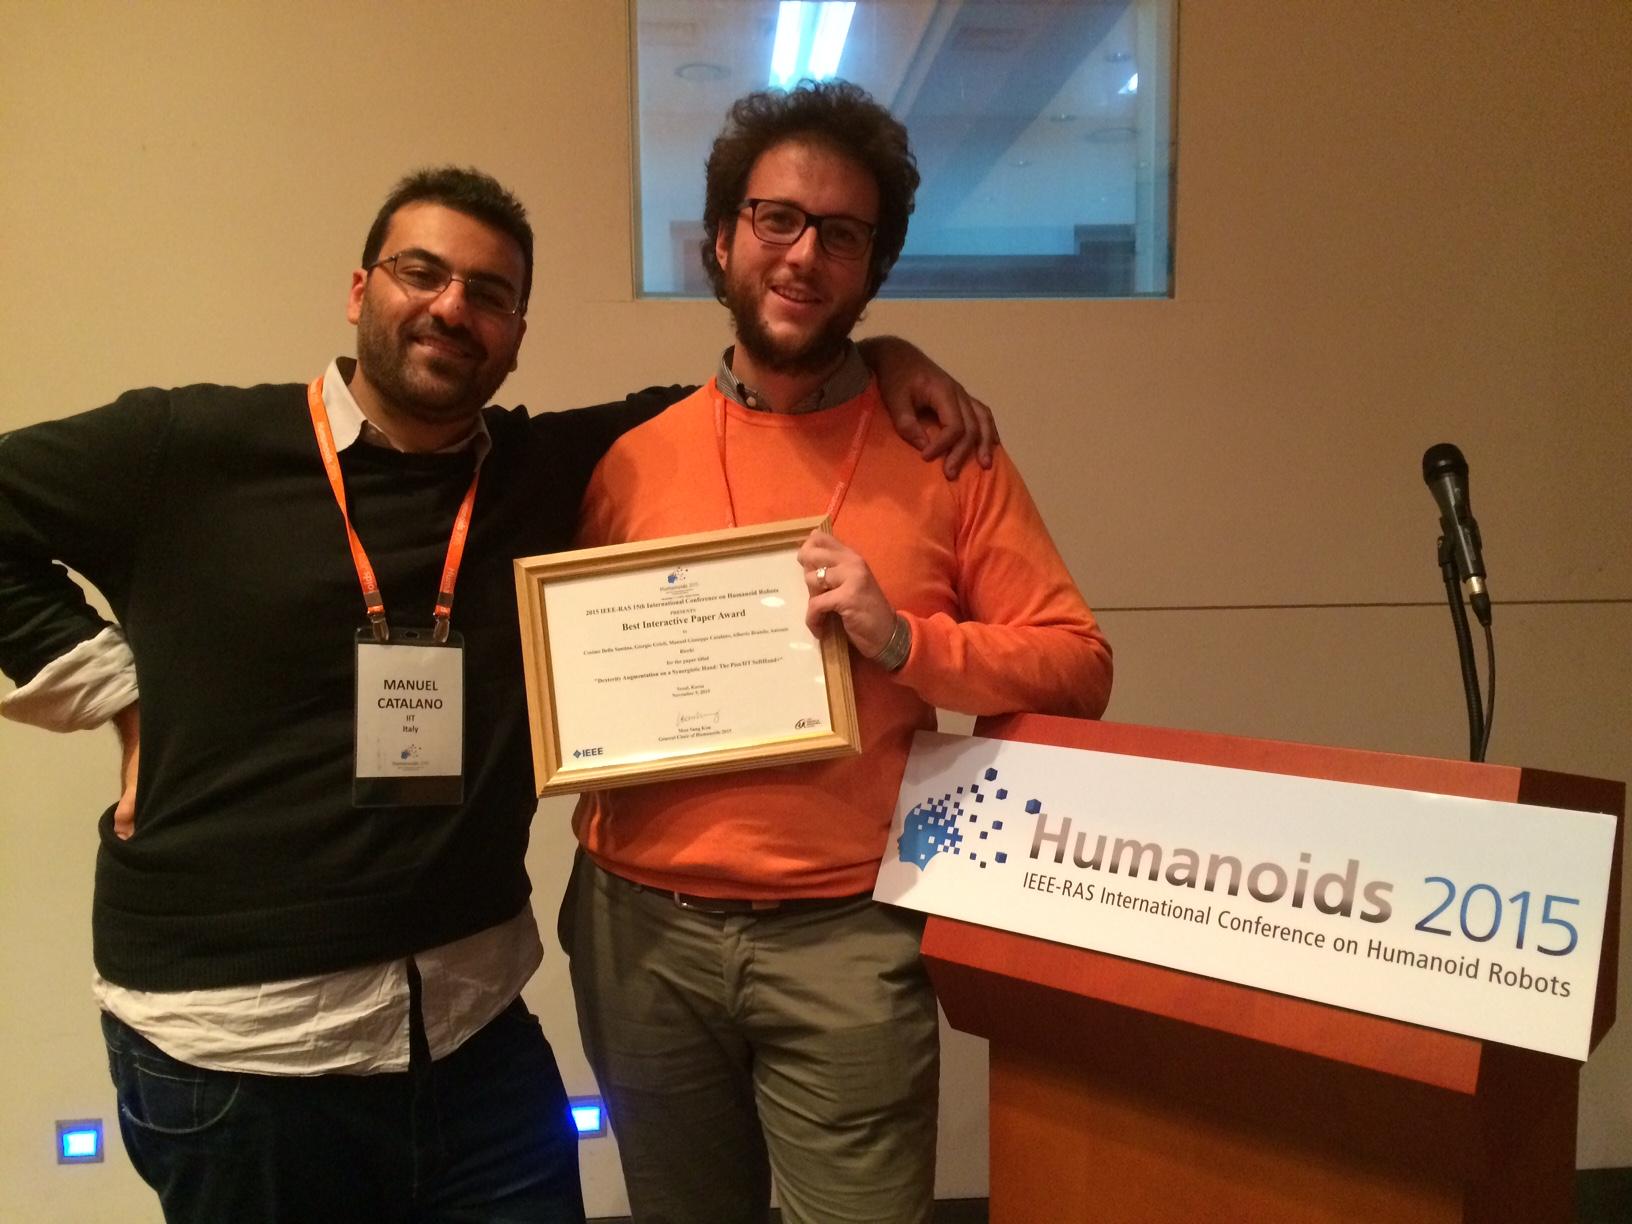 BEST INTERACTIVE PAPER AWARD AT HUMANOIDS 2015!